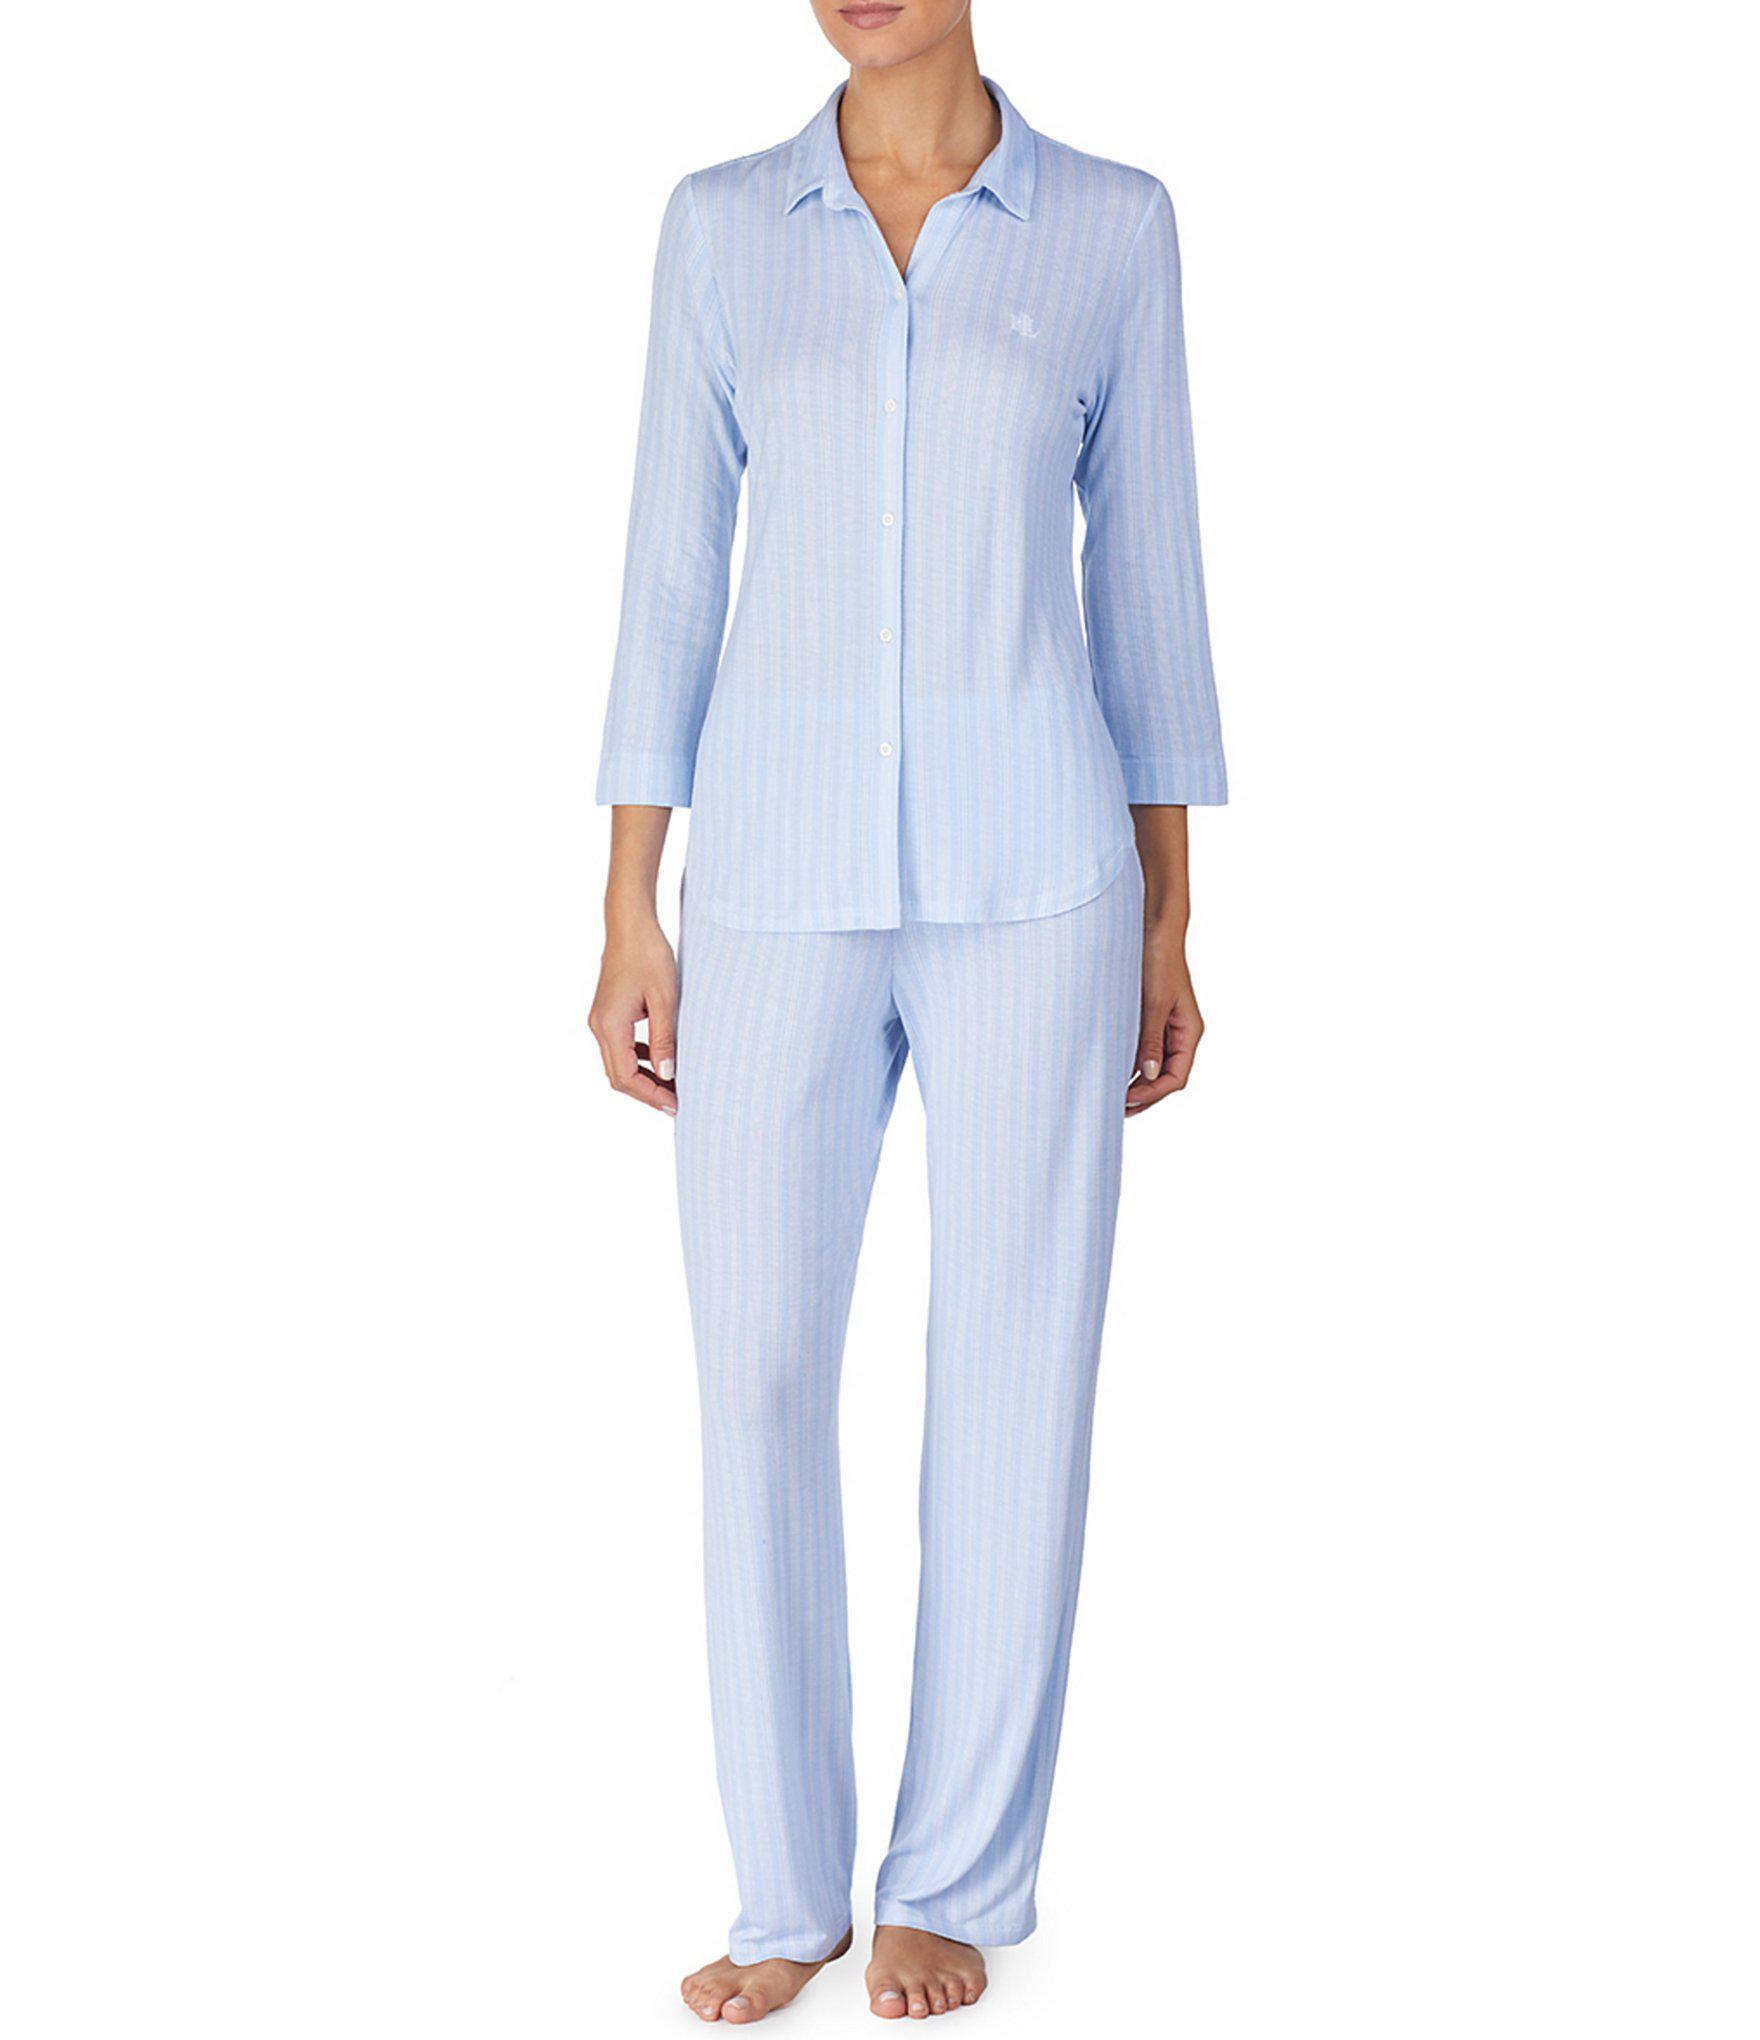 Lauren by Ralph Lauren. Women s Blue Petite Striped-print Jersey Knit  Pajamas 3cd75fcda